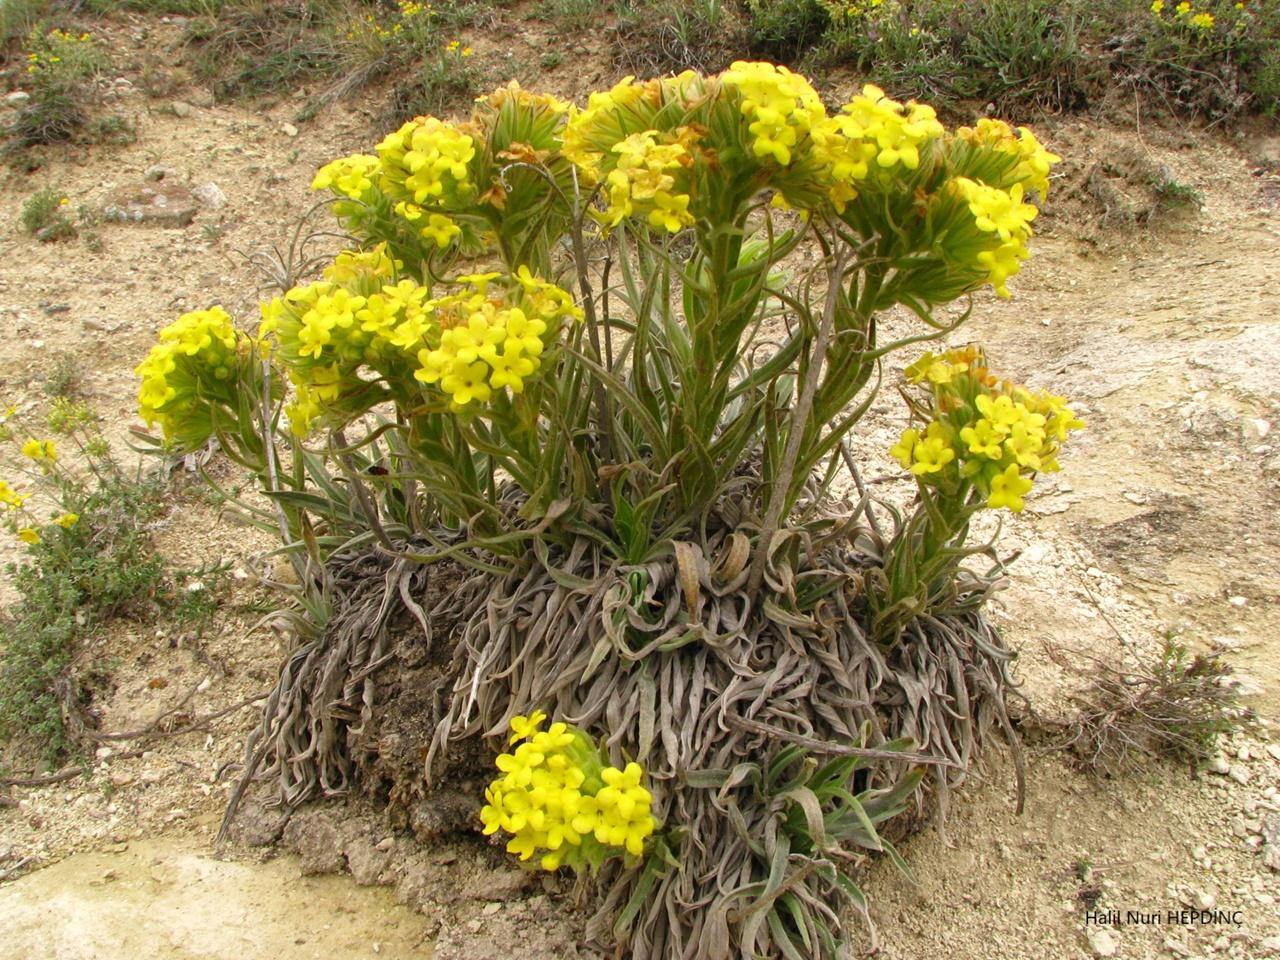 Koca eğnik(Macrotomia densiflora) (Eş Ad: Arnebia densiflora)